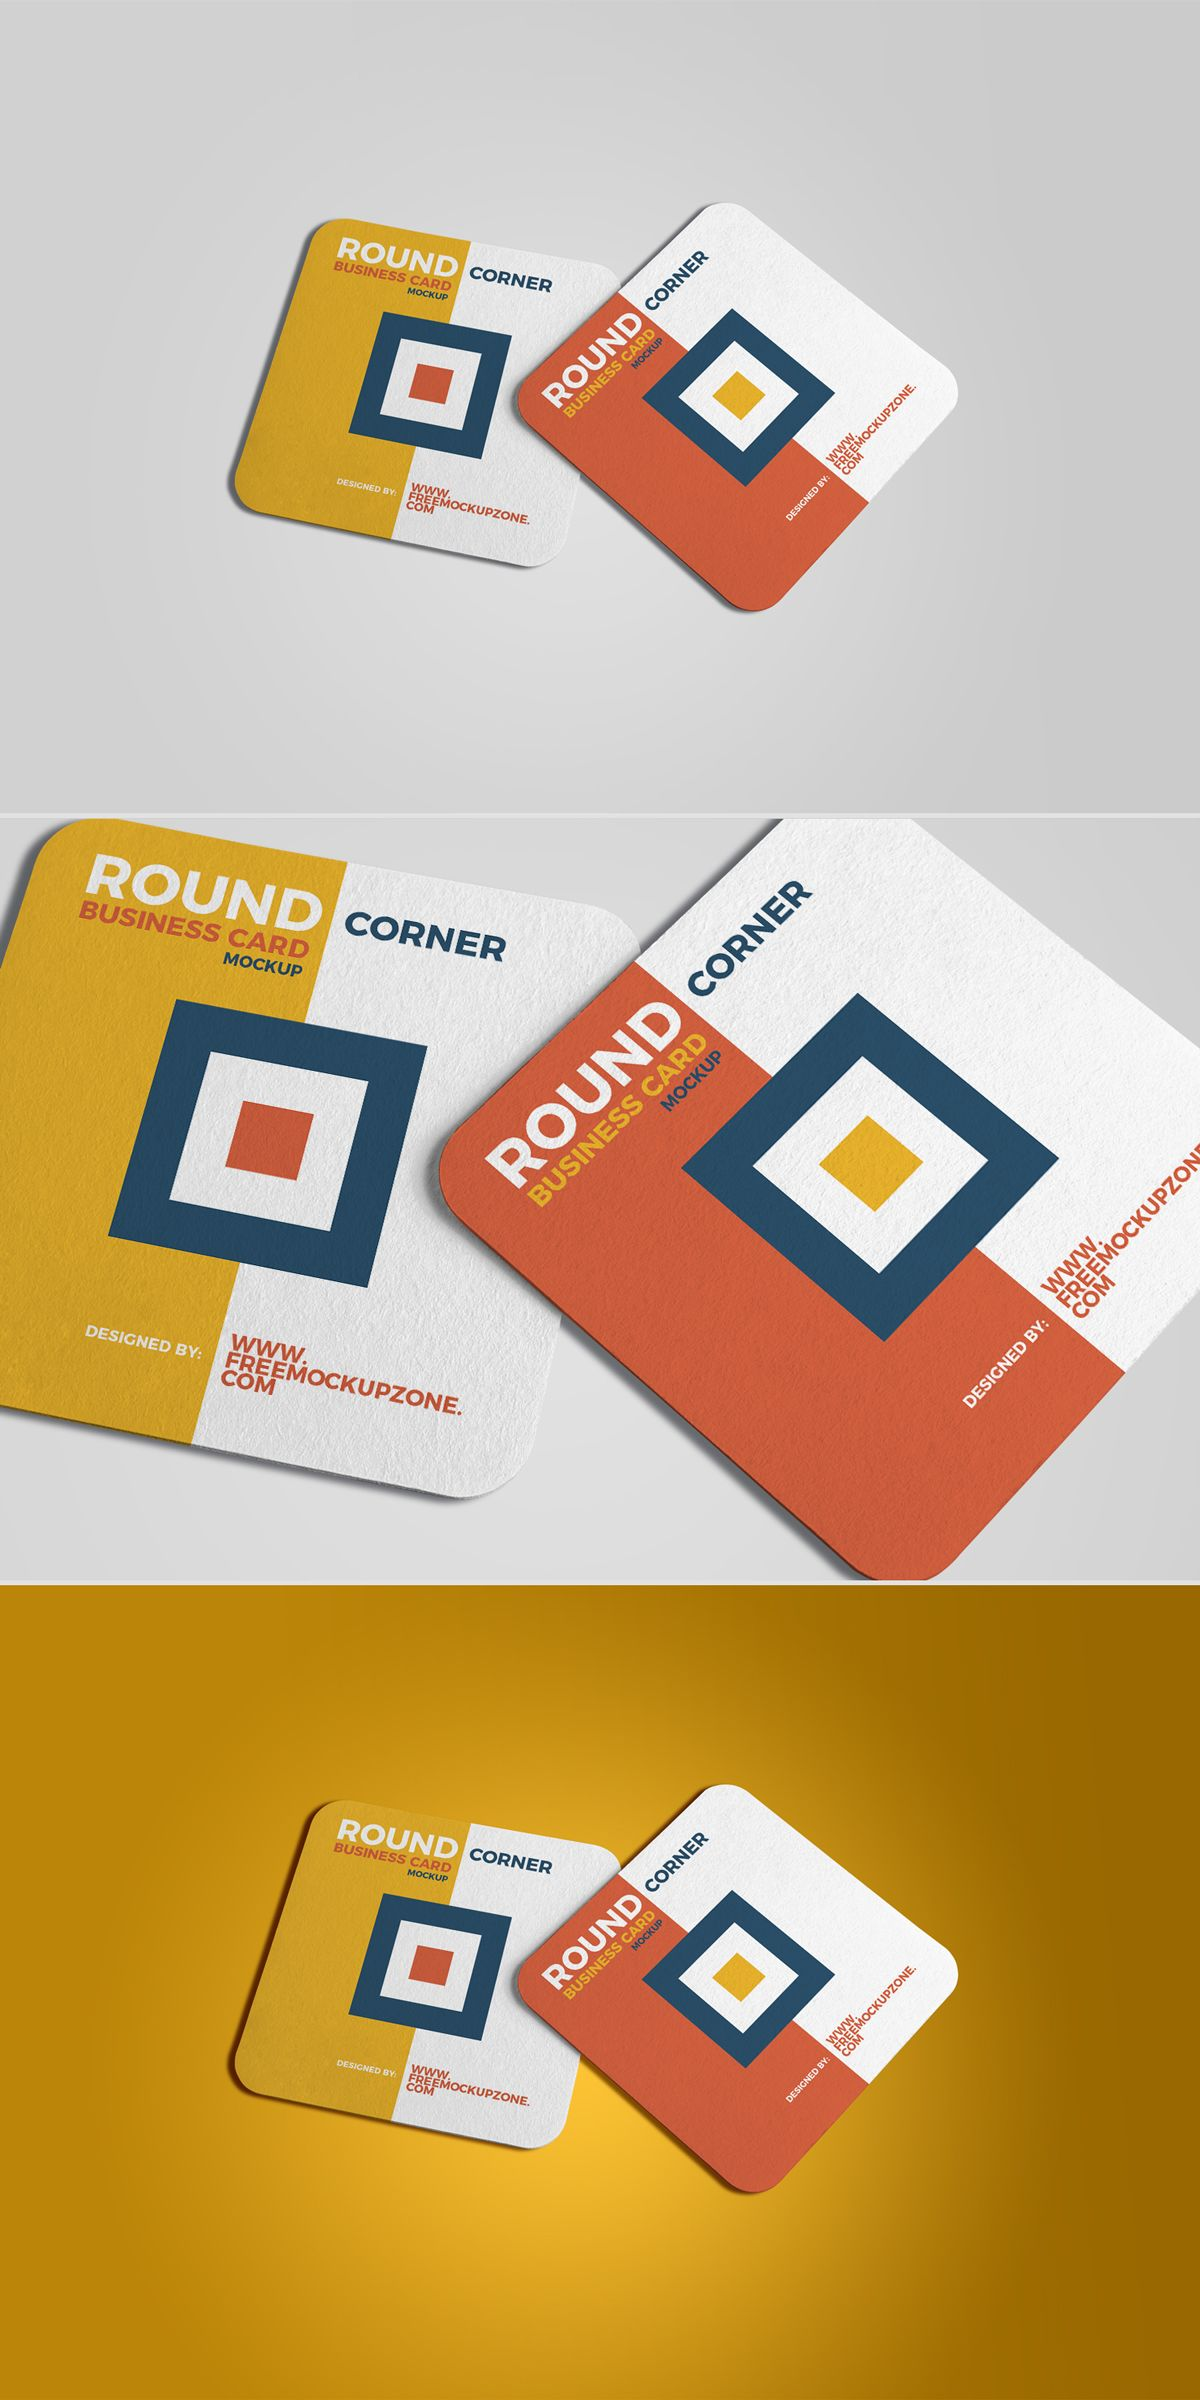 Free square round corner business card mockup 2018 on